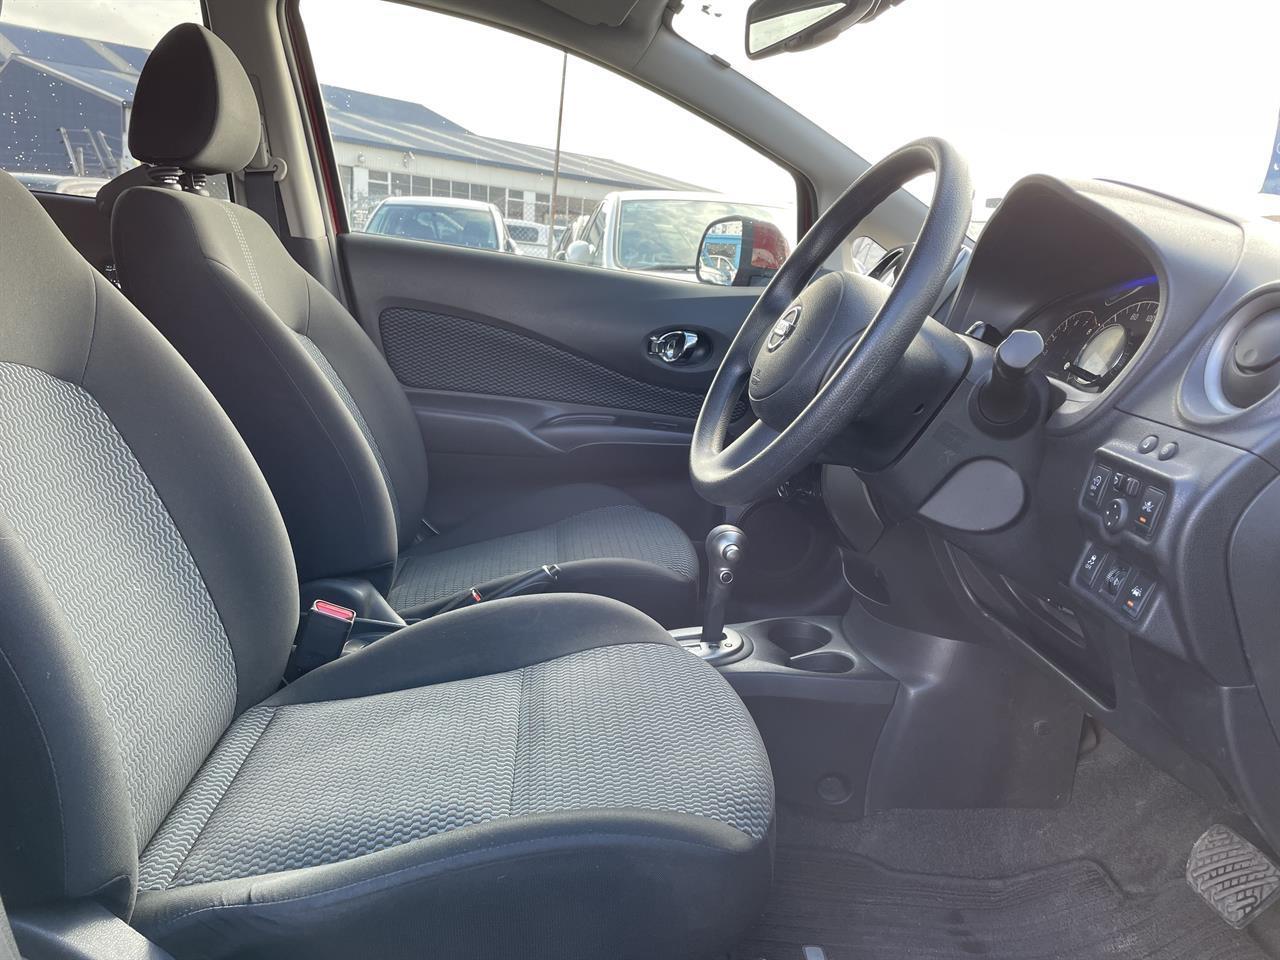 image-7, 2013 Nissan Note at Christchurch